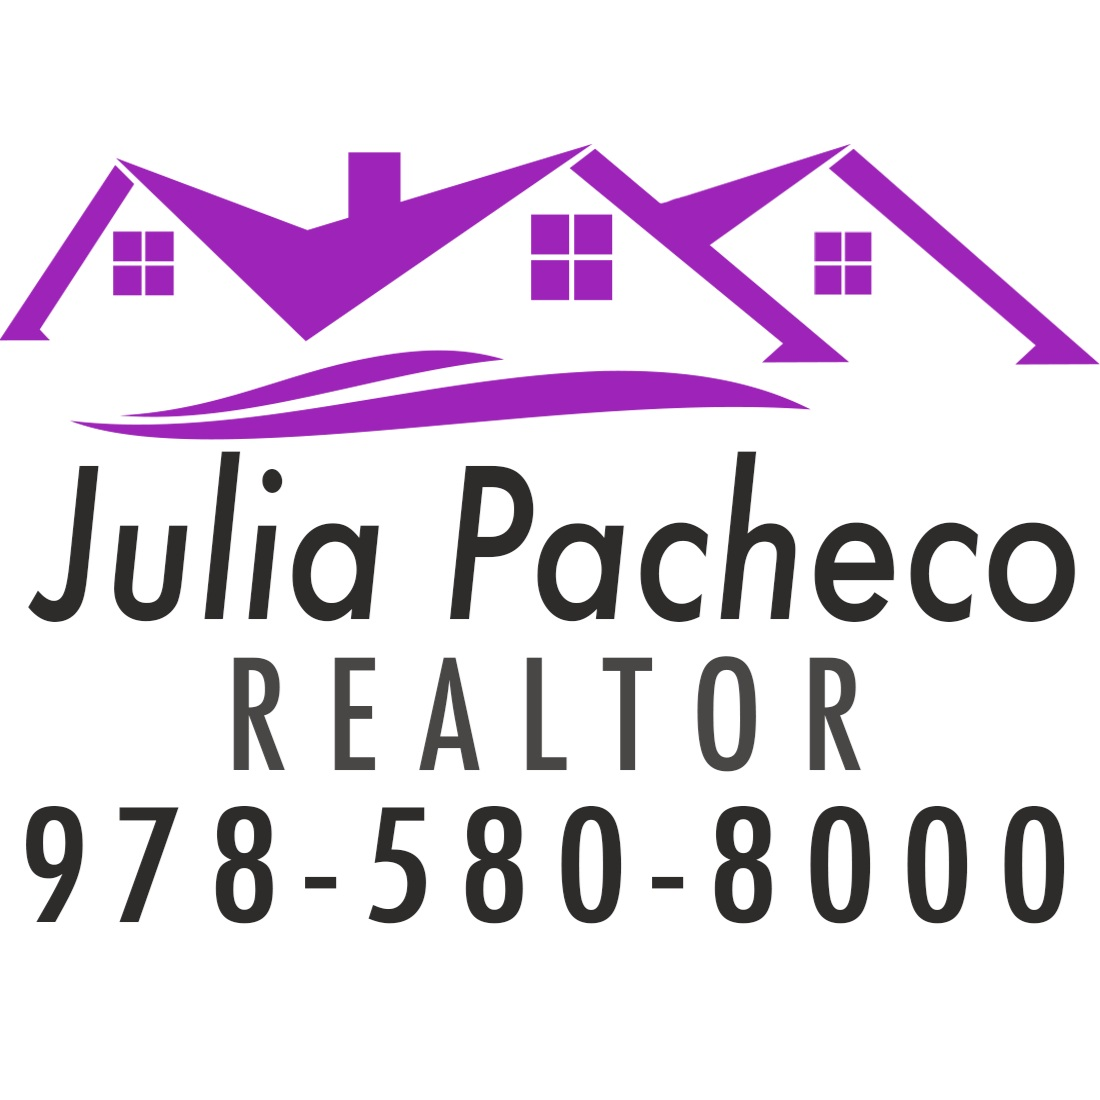 Julia+Pacheco+Logo+%282%29.jpg